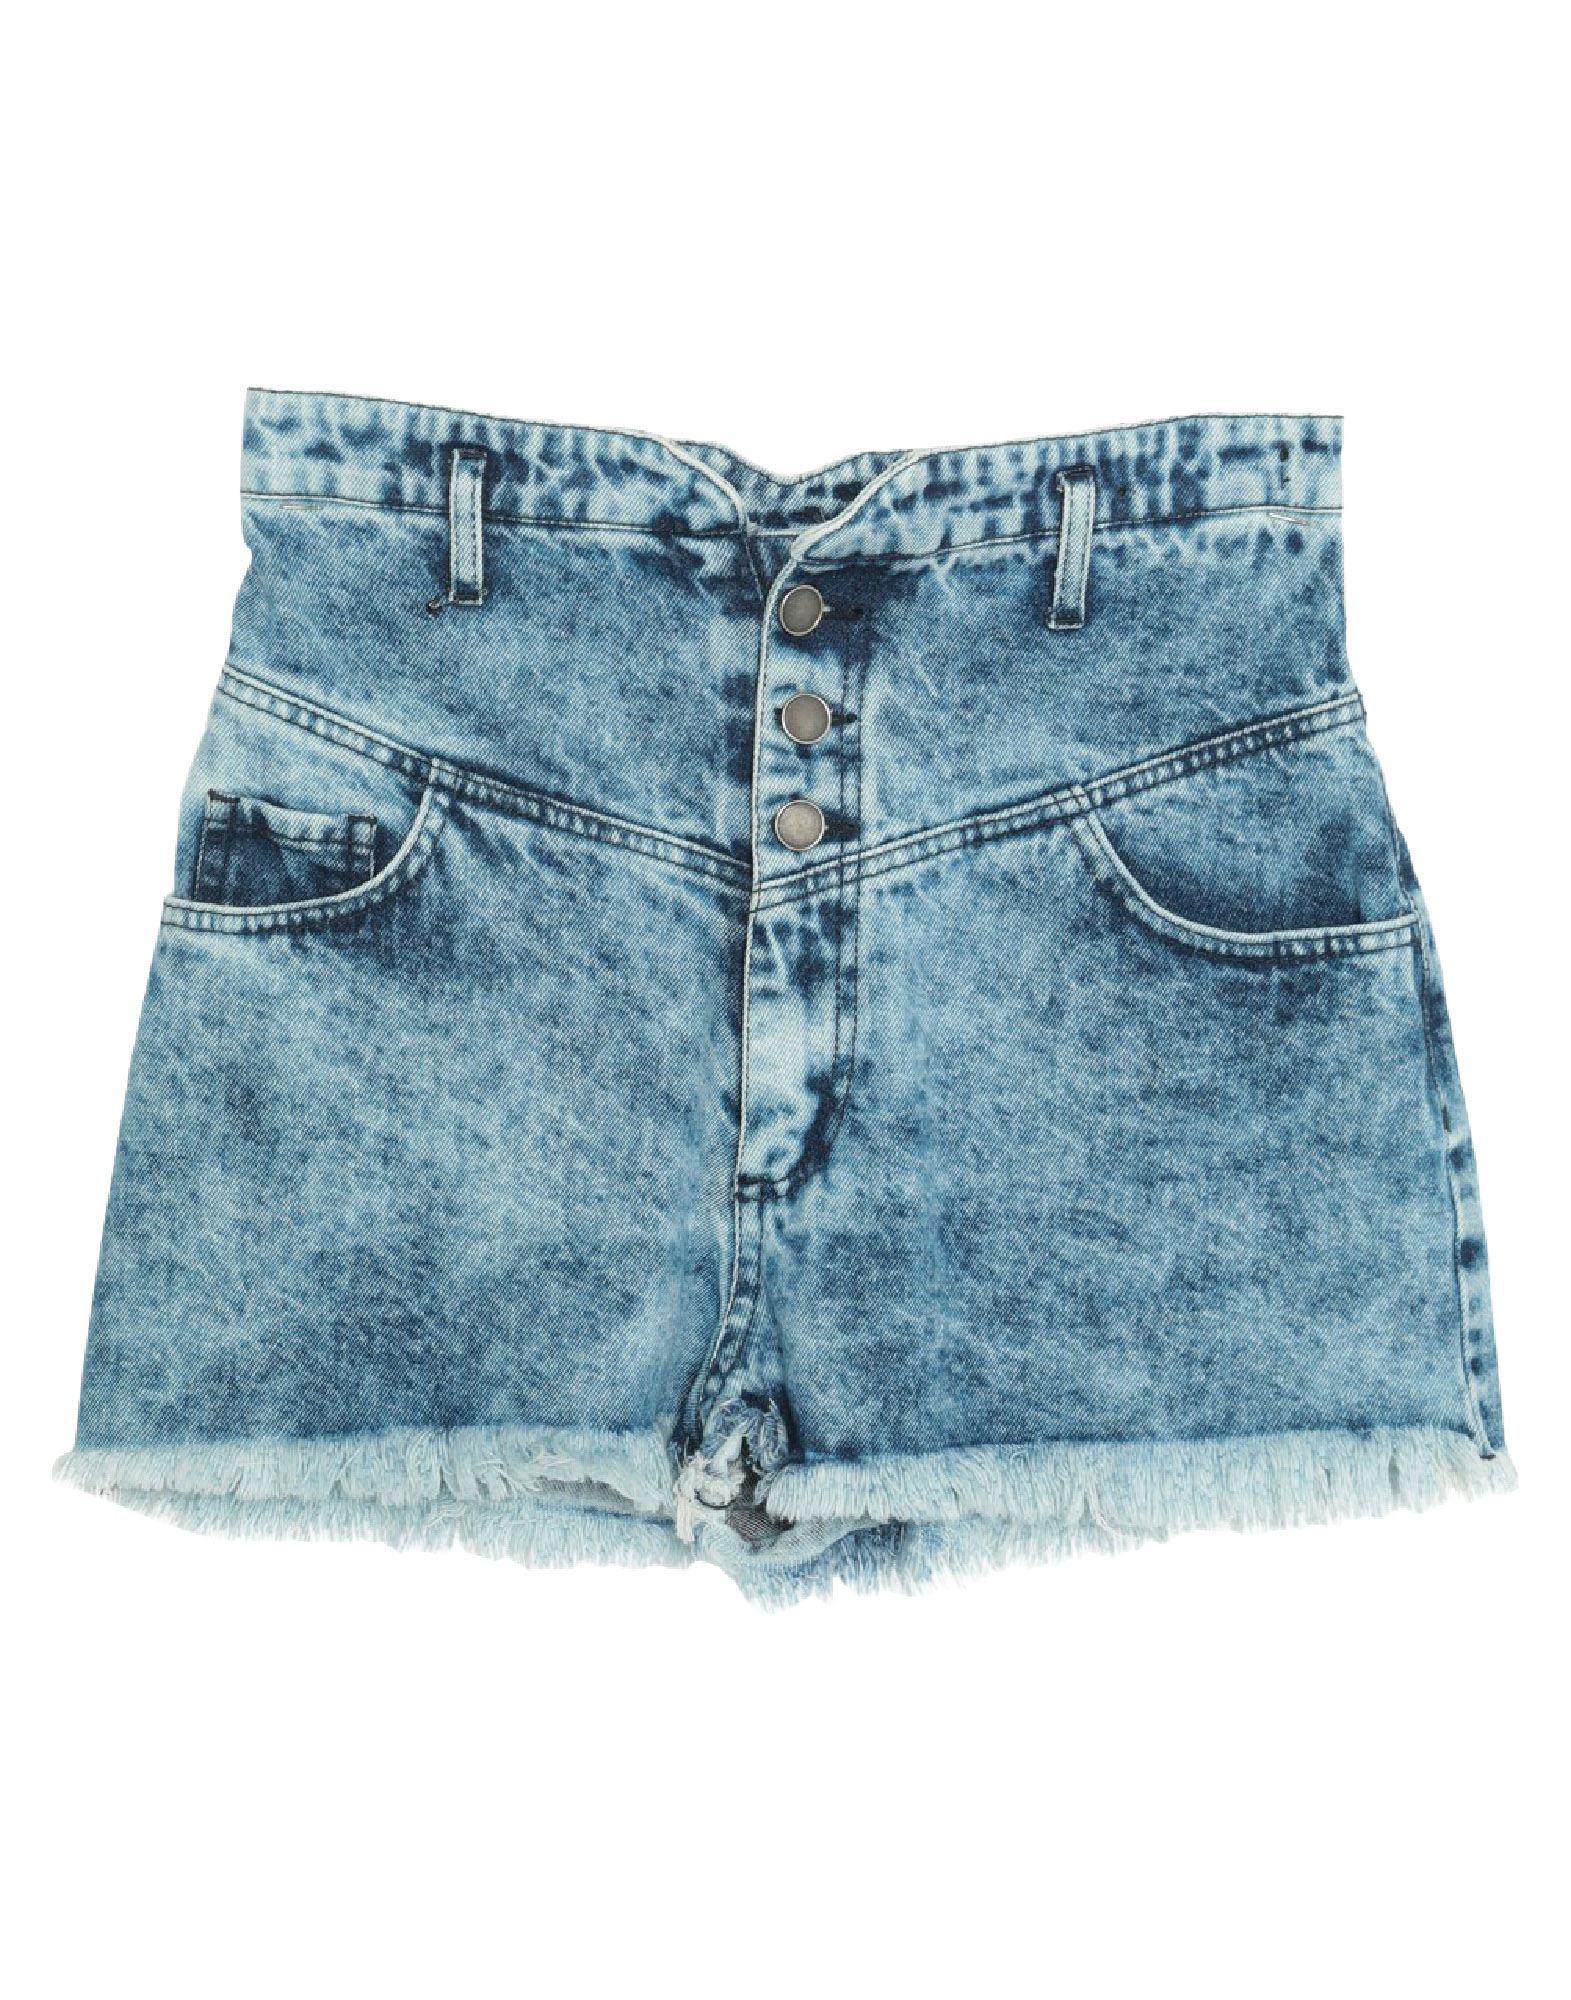 Actualee Denim Shorts In Blue